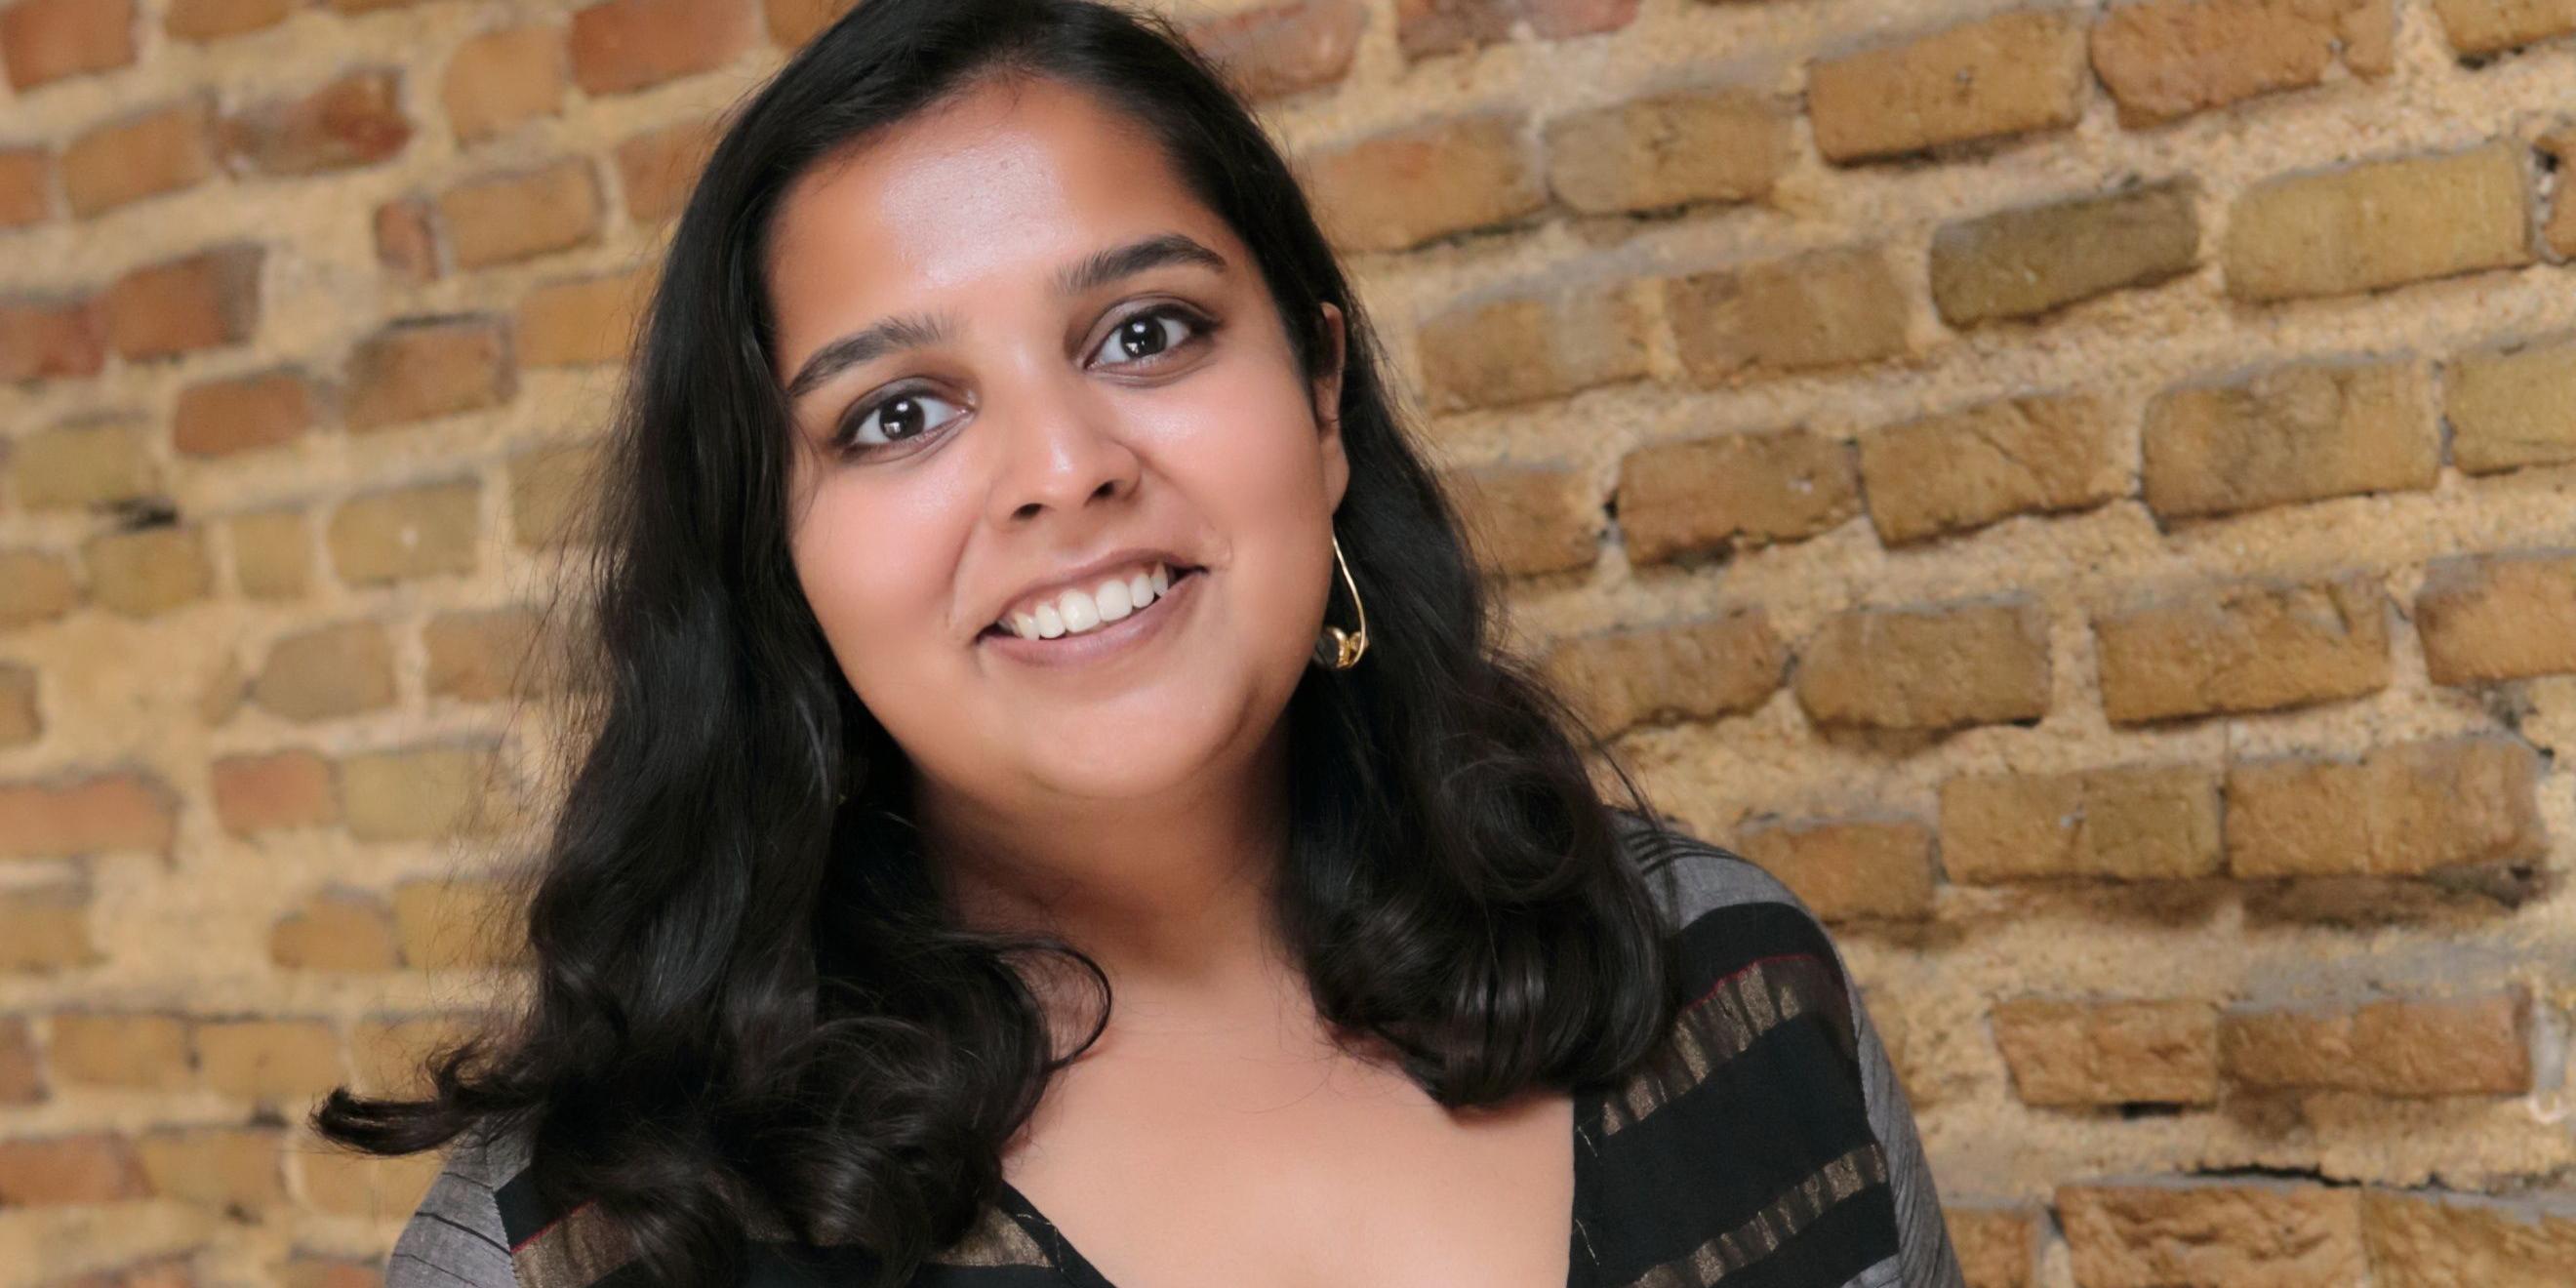 Sumona Chakravarty, India, participant in the GCLP 2017 edition